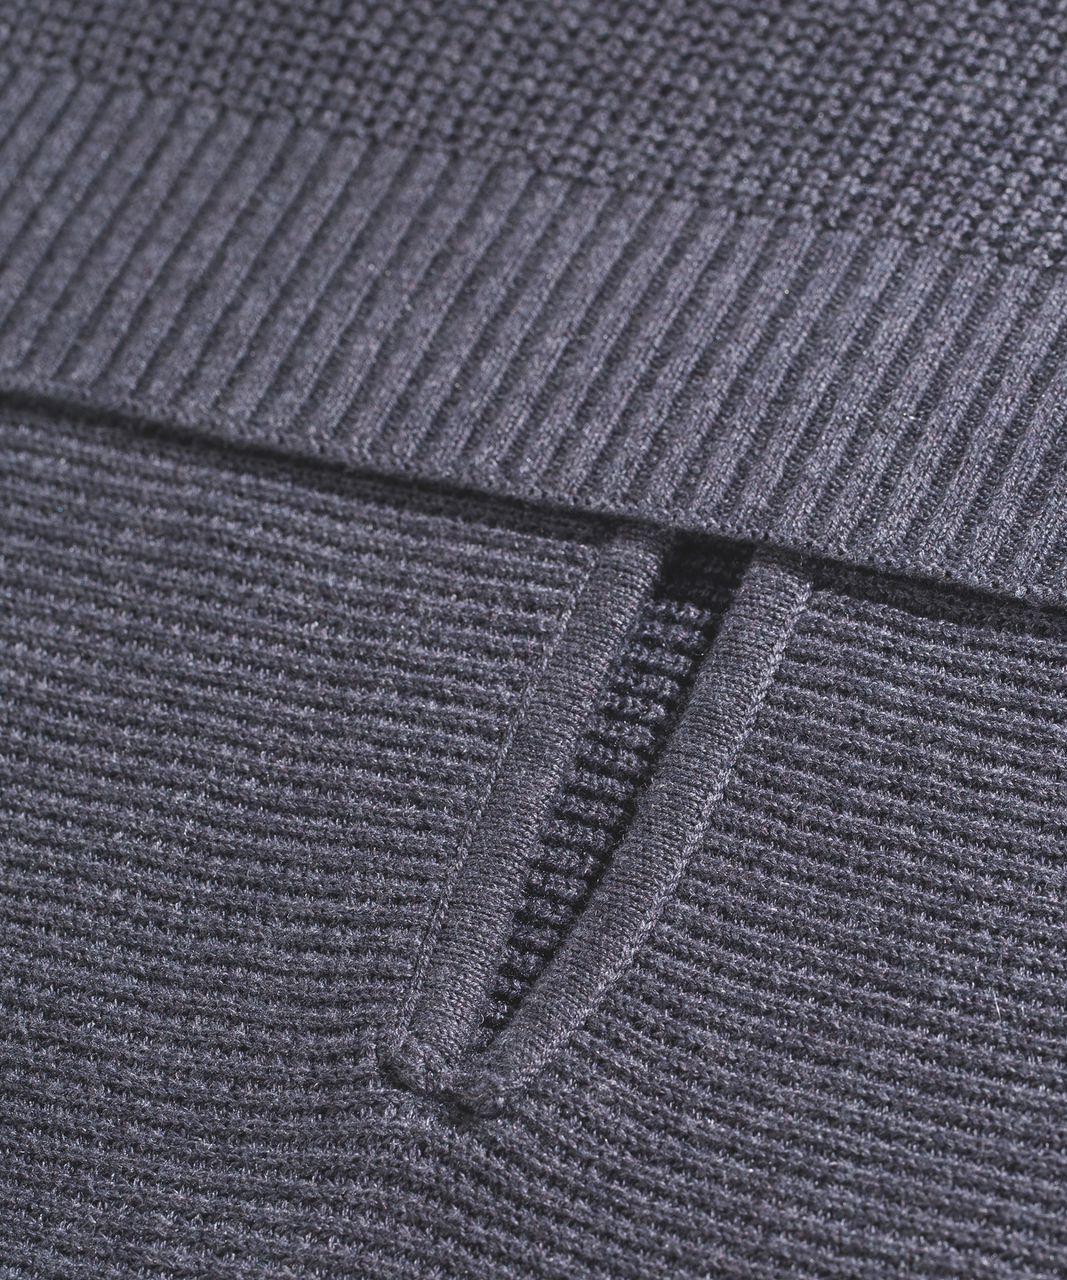 Lululemon Forward Flow Cape - Heathered Dark Carbon